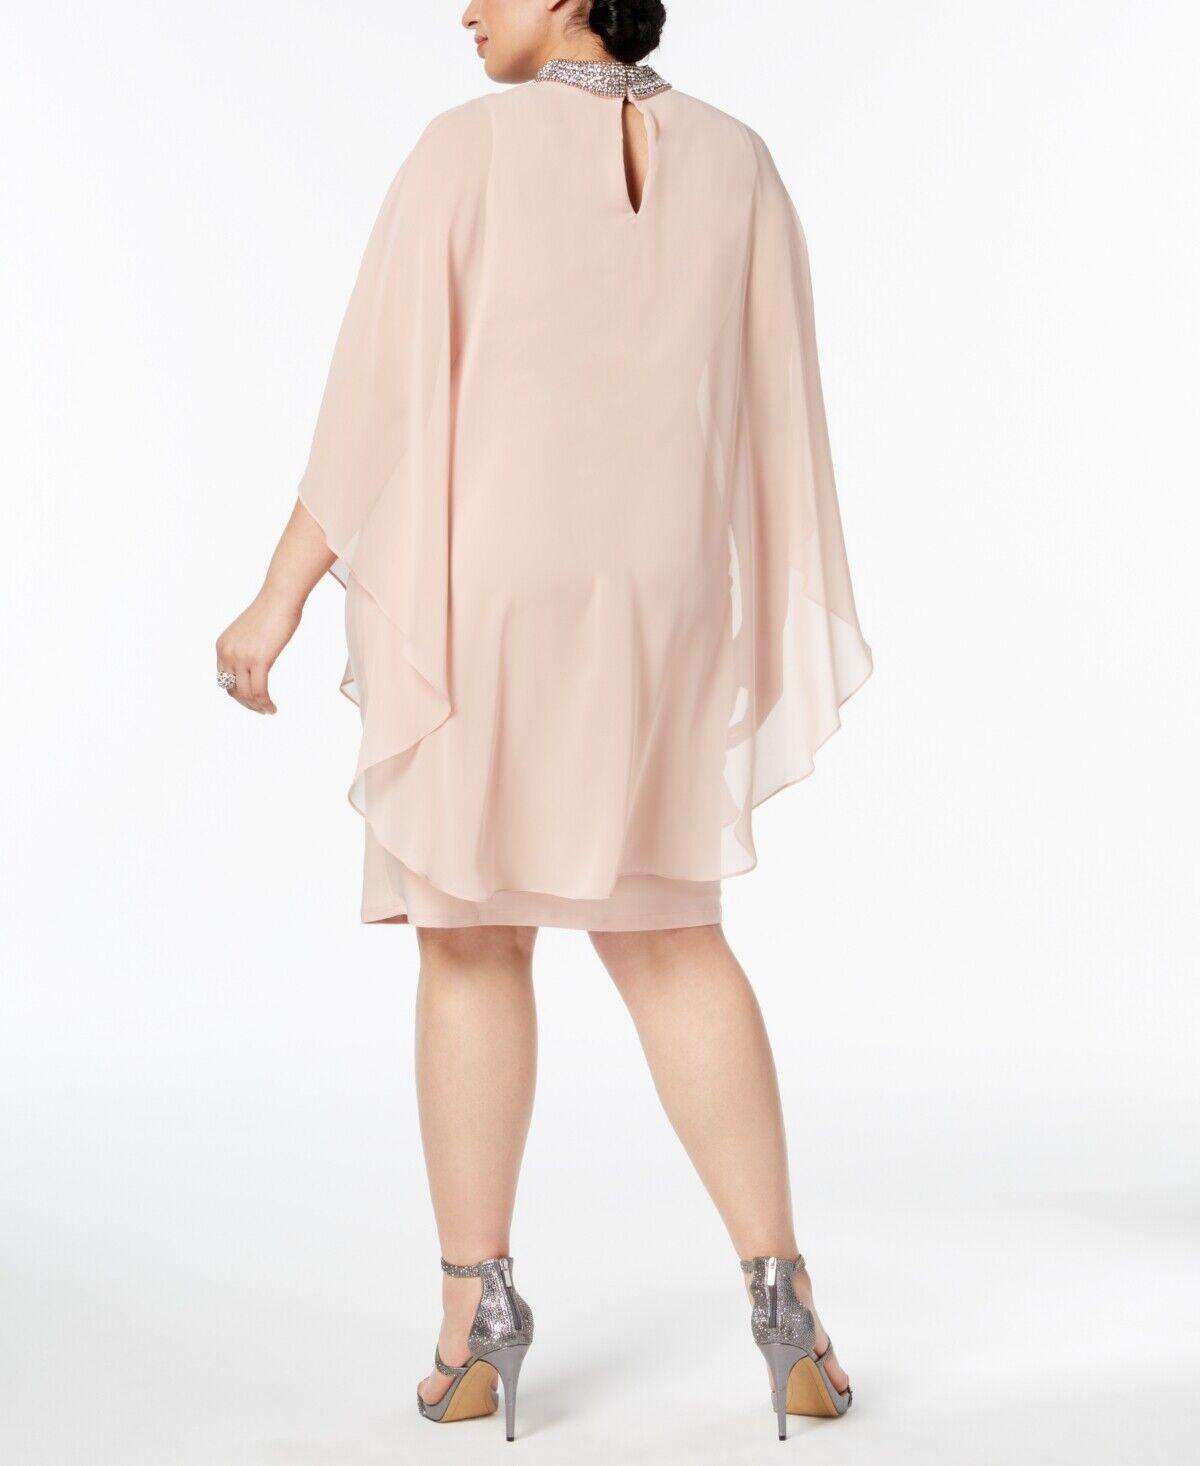 Xscape Womens Pink Chiffon Overlay Jeweled Cocktail Dress Plus 18W BHFO 9637